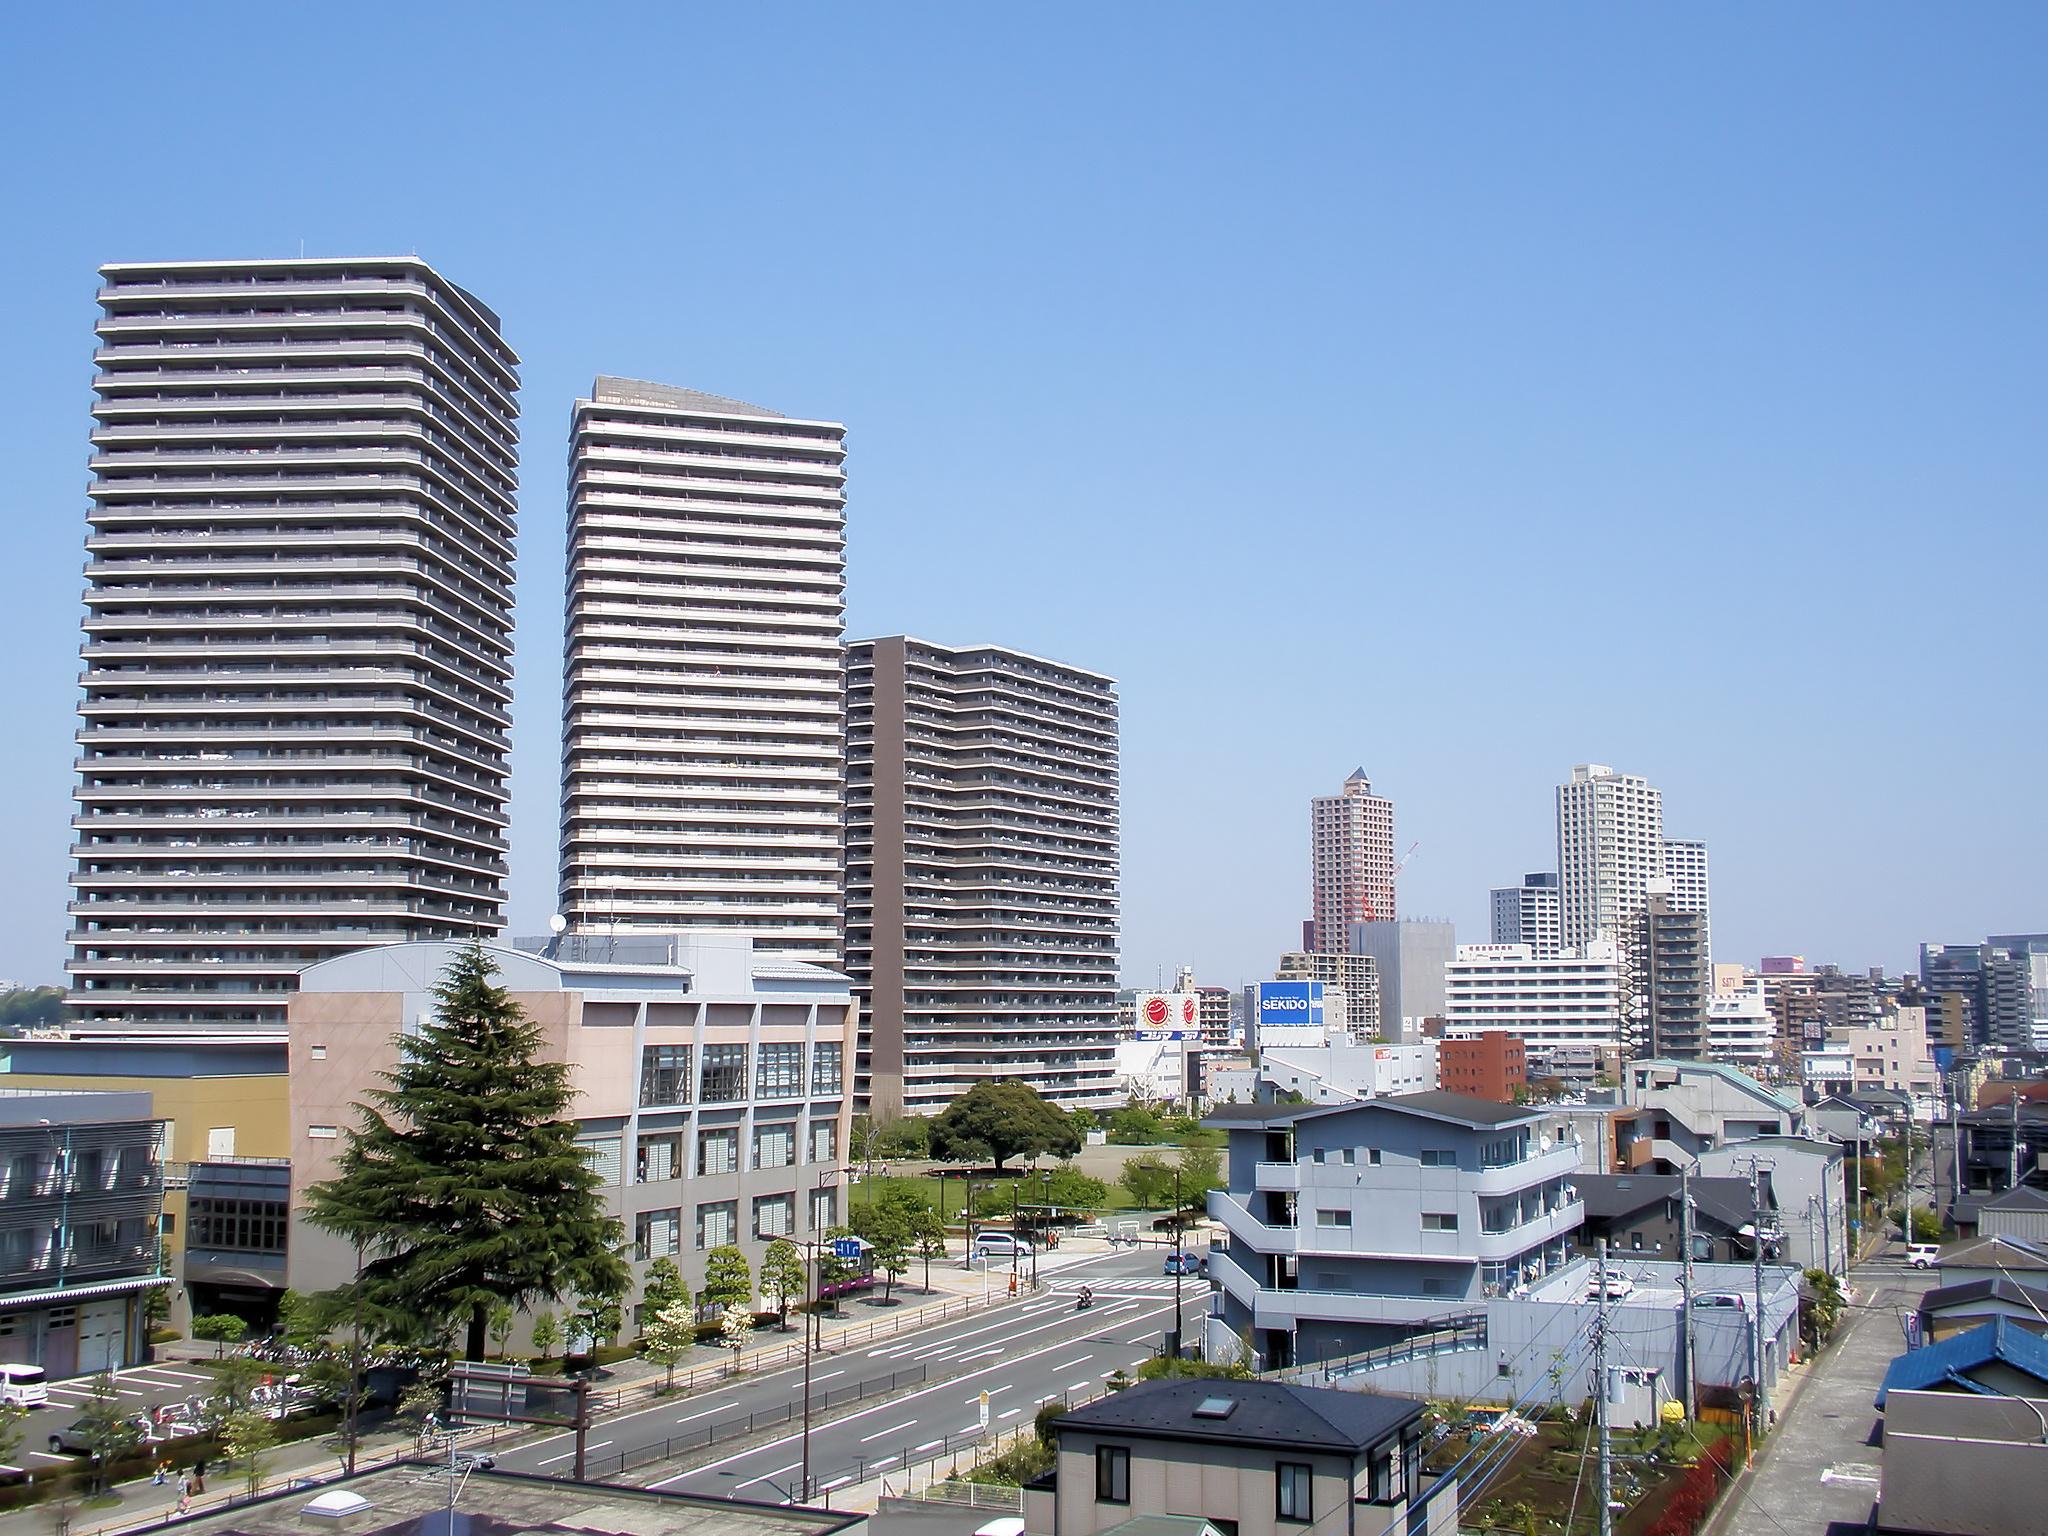 http://upload.wikimedia.org/wikipedia/commons/d/d3/Hashimoto,_Sagamihara.jpg